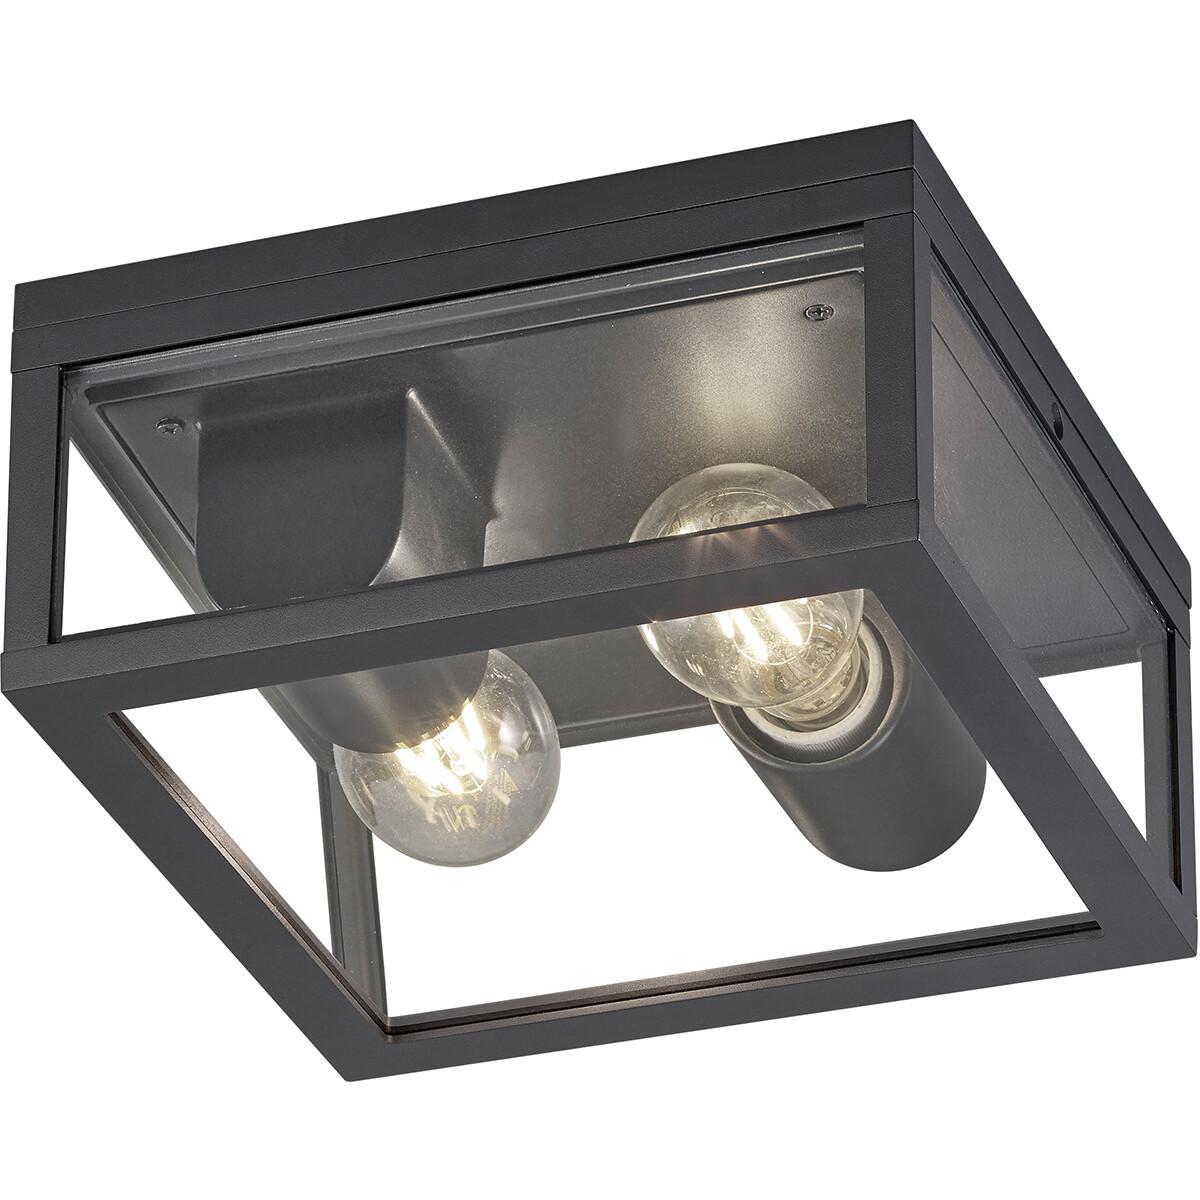 LED Tuinverlichting - Tuinlamp Plafond - Trion Garinola - E27 Fitting - 2-lichts - Mat Zwart - Alumi